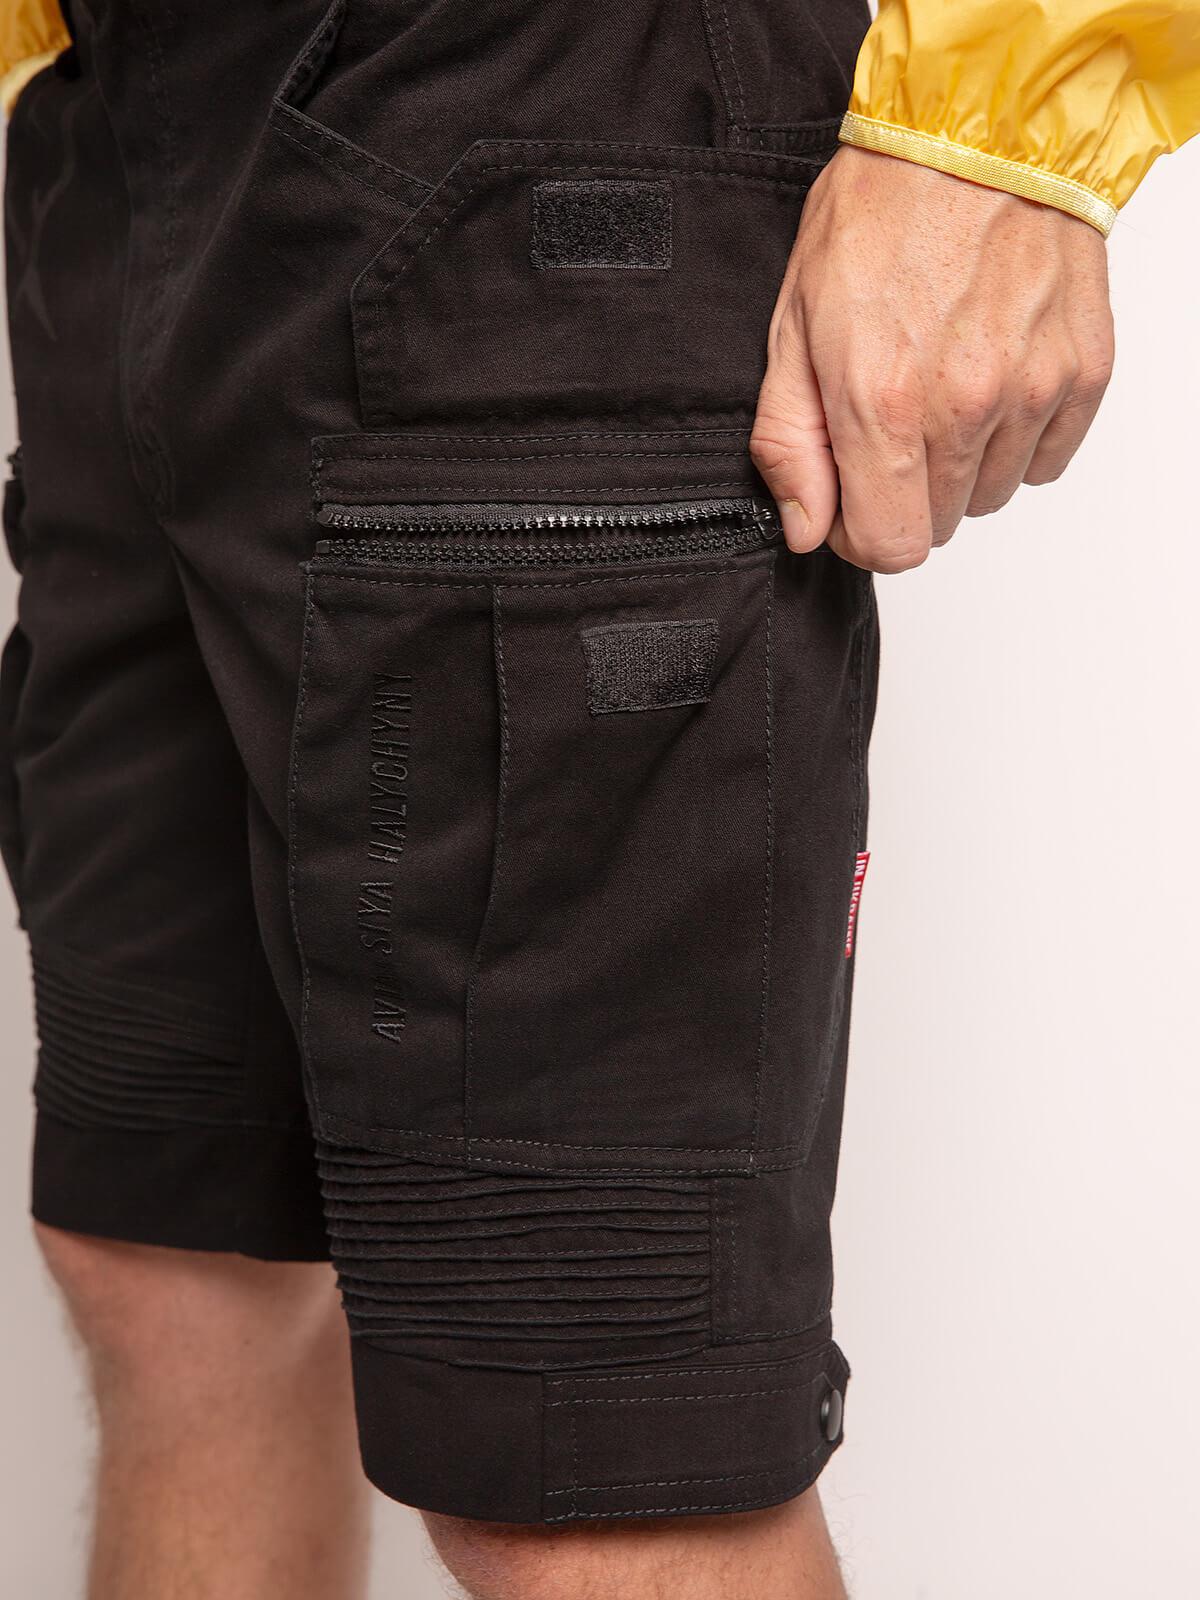 Men's Shorts Flyer. Color black. 6.